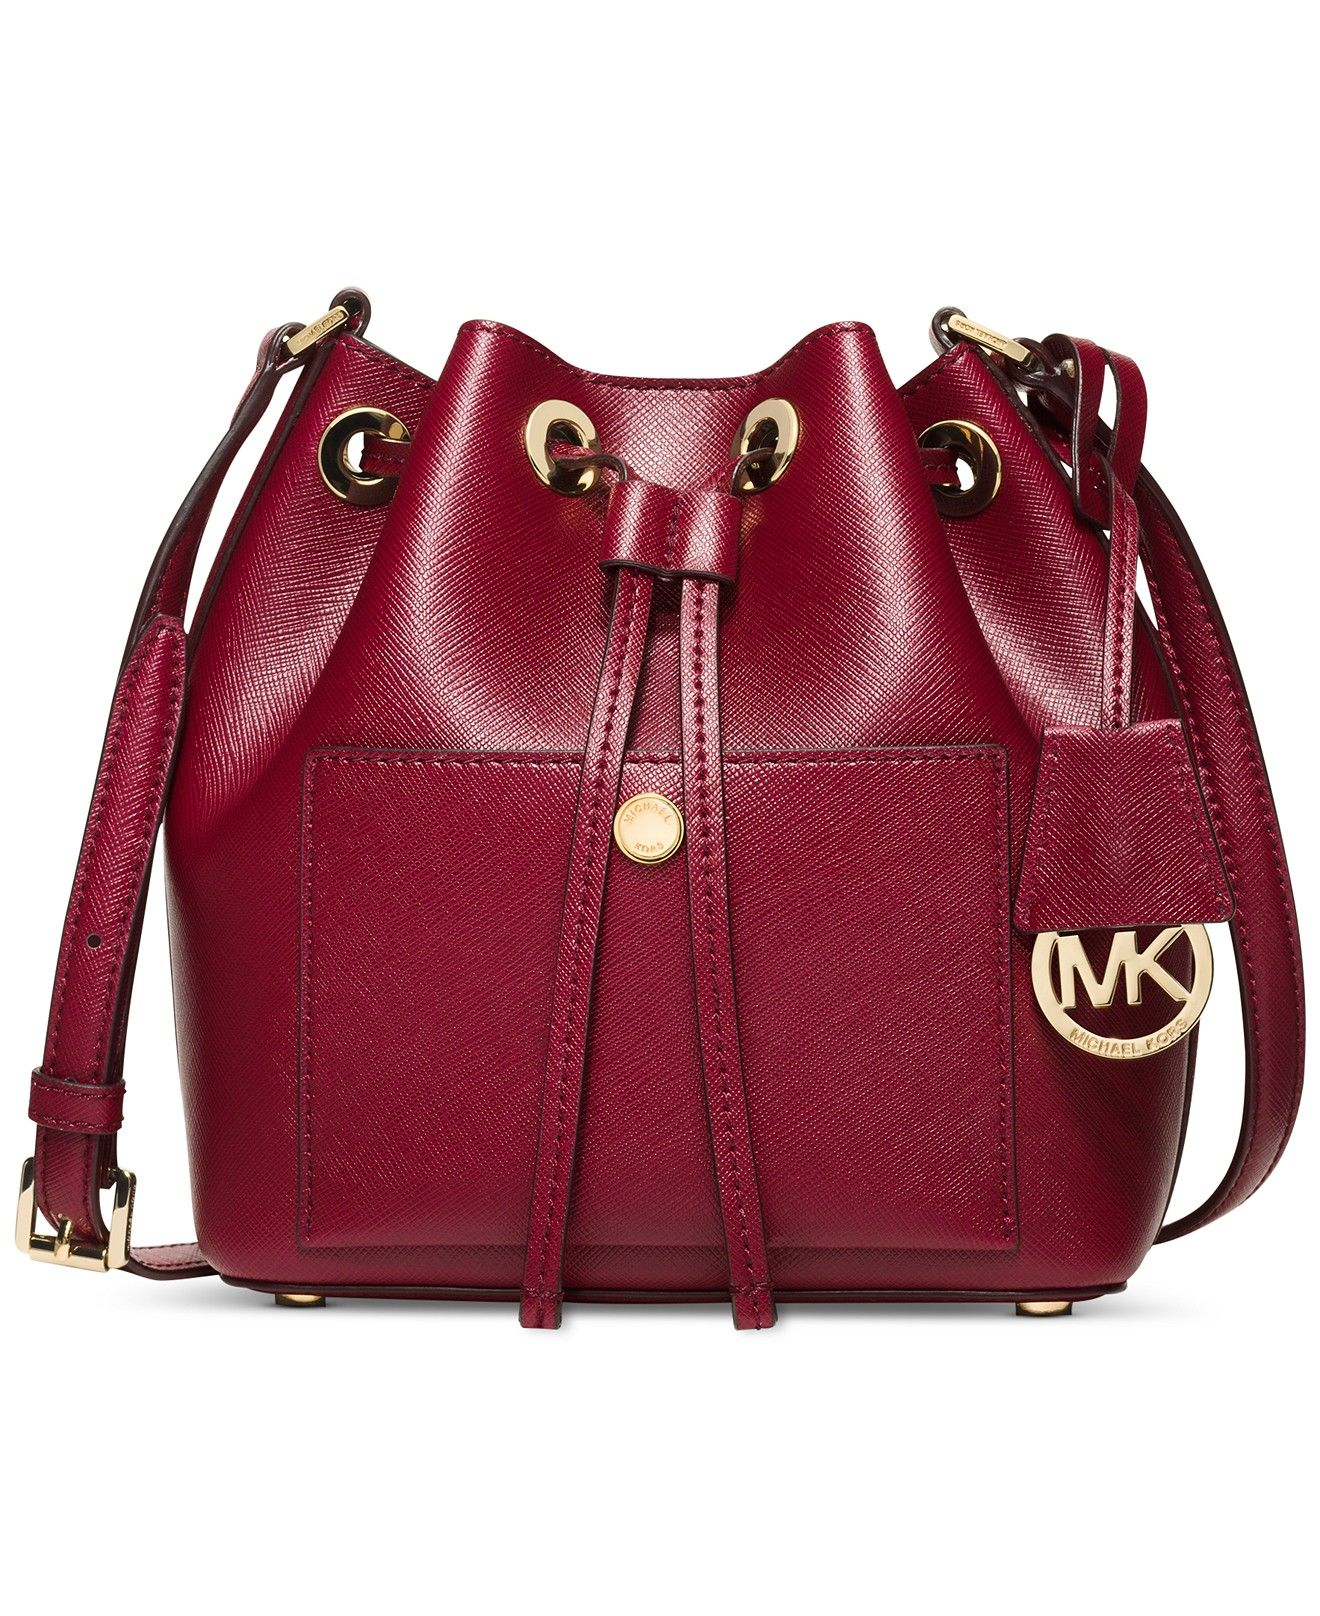 4ce03fd16f39 MICHAEL Michael Kors Greenwich Small Bucket Bag - Michael Kors Handbags -  Handbags   Accessories - Macy s